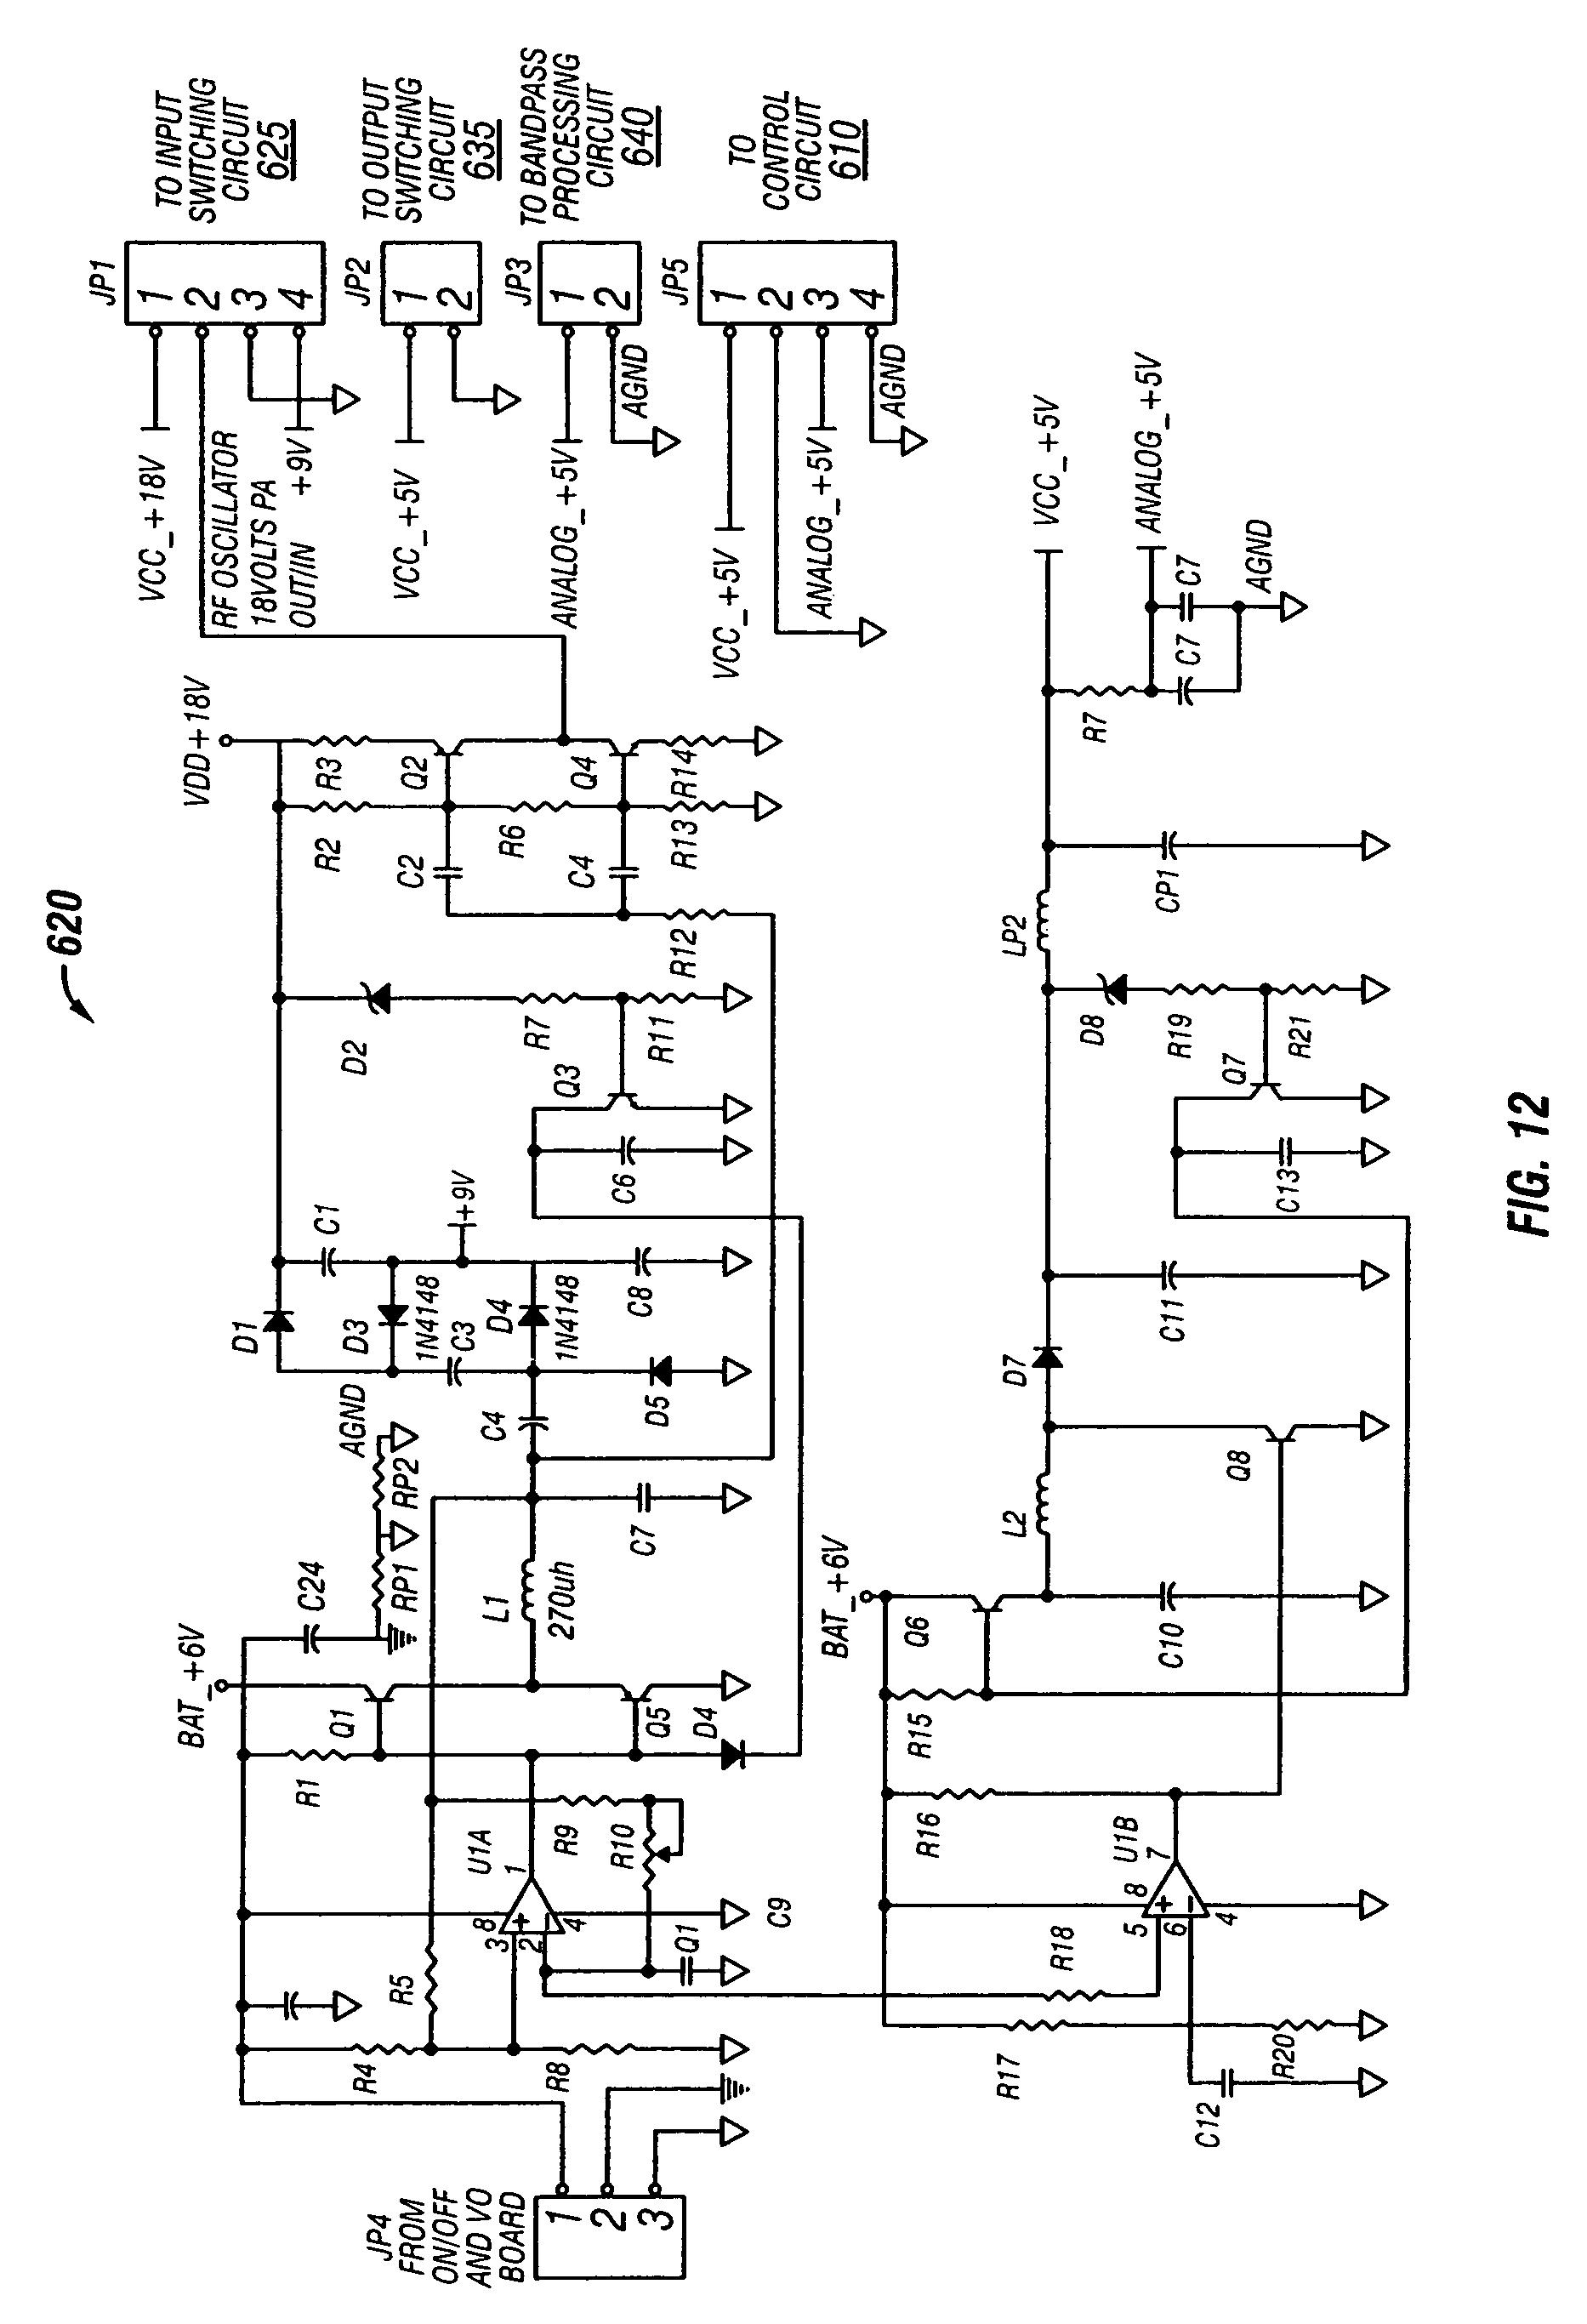 WRG-3991] G32 Wiring Diagram on